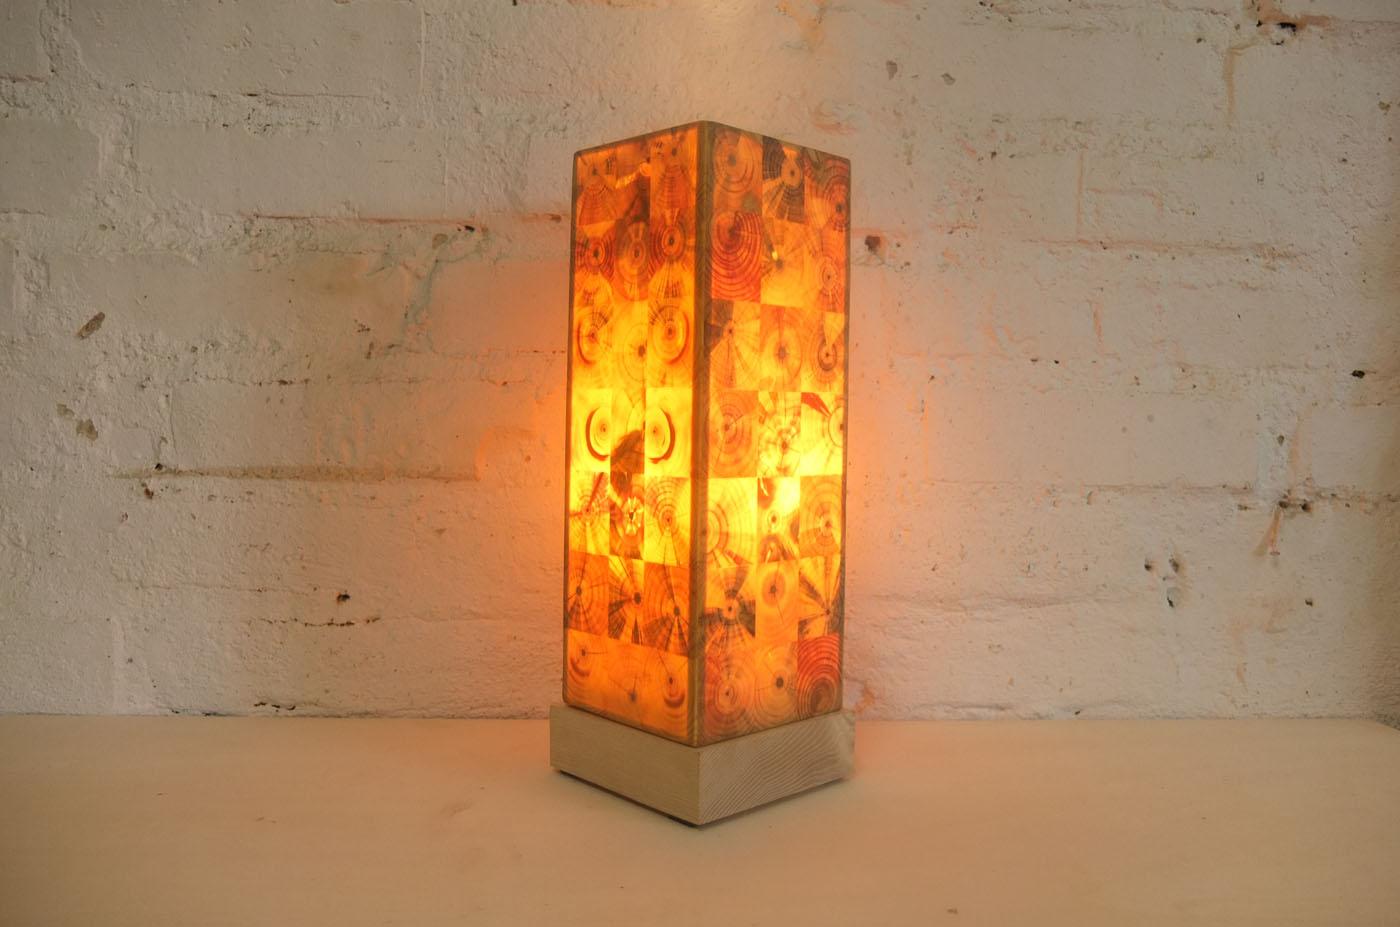 holz leuchtet designerlampen aus hirnholz s chsischer staatspreis f r design 2016. Black Bedroom Furniture Sets. Home Design Ideas